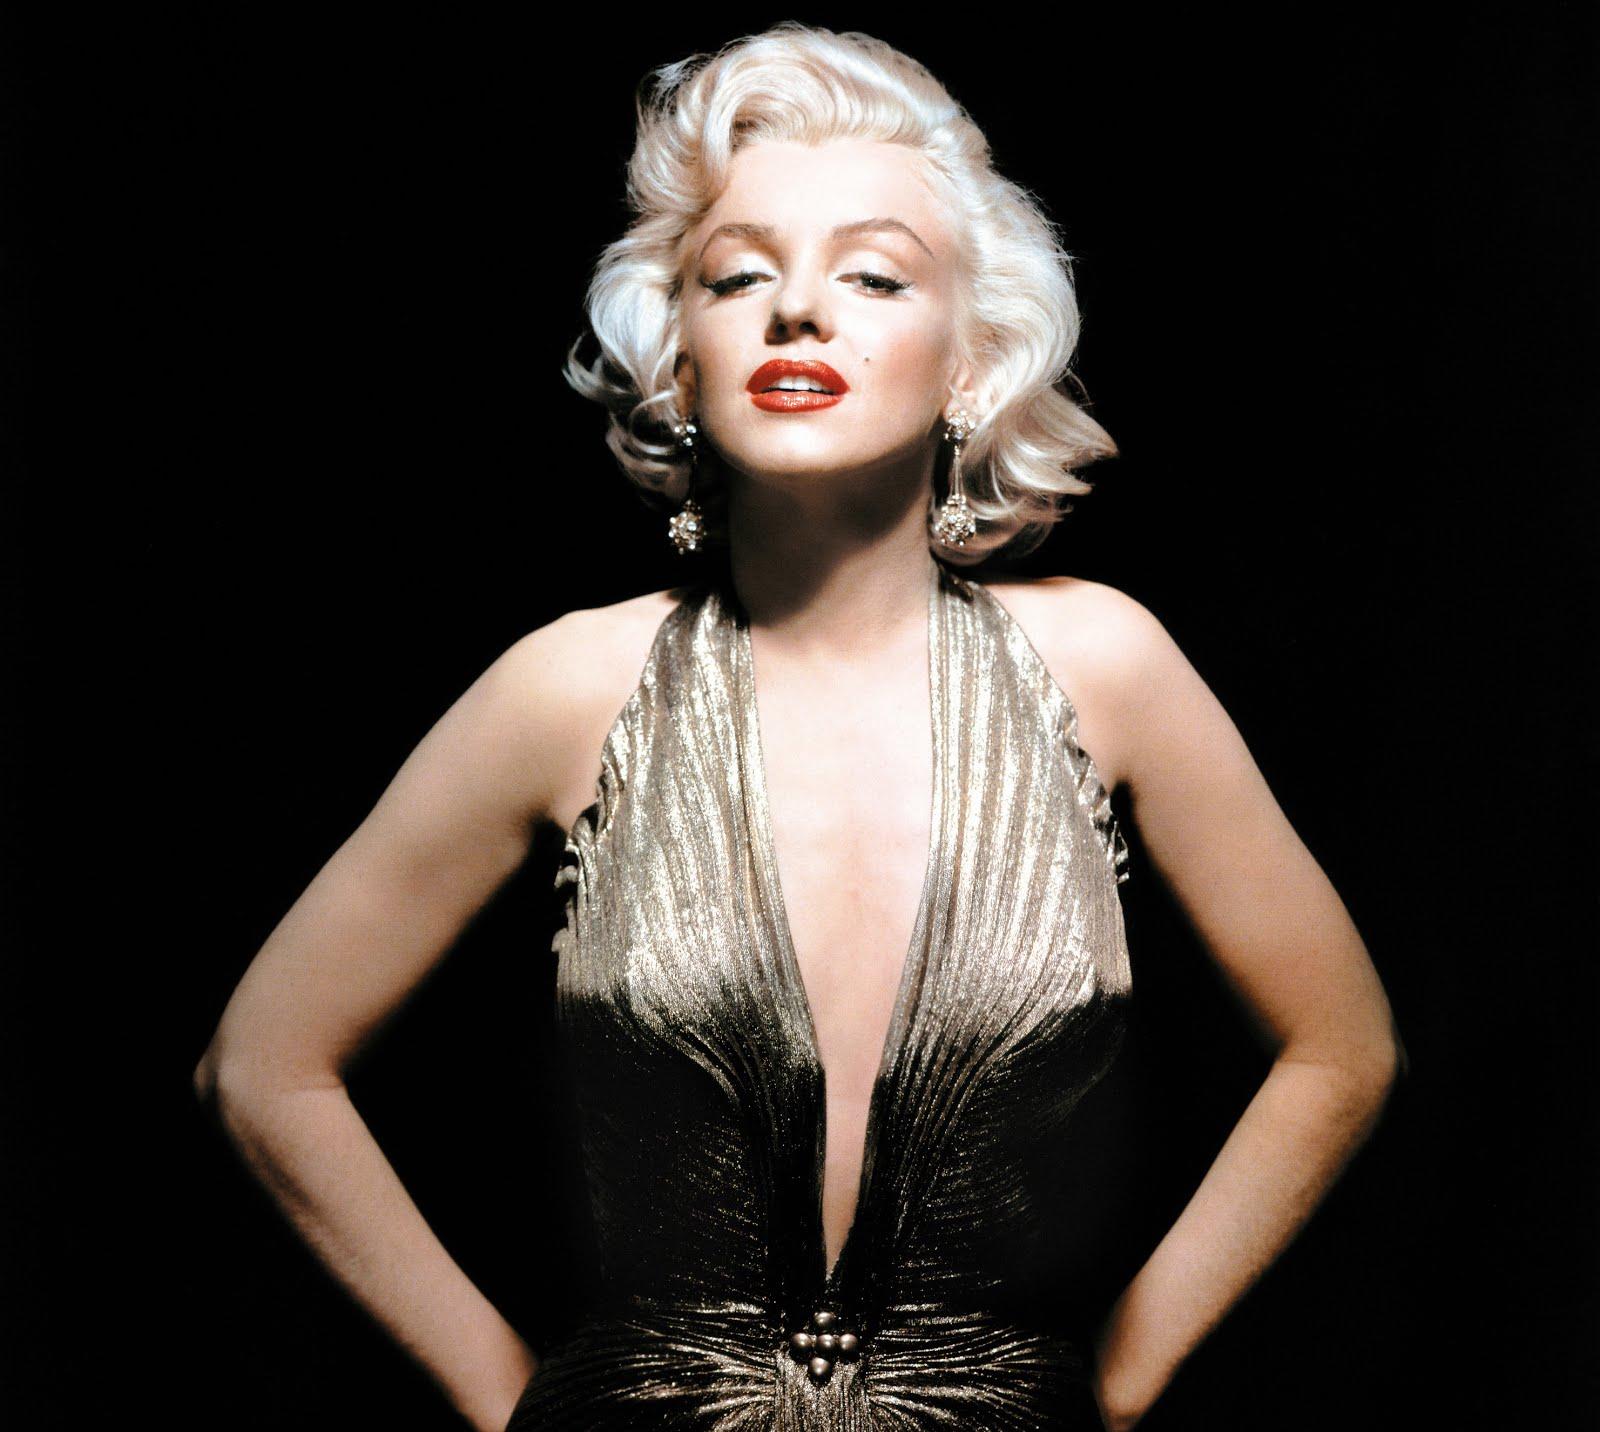 http://3.bp.blogspot.com/-QCCS15YcWCY/UO19csptZzI/AAAAAAAAN_E/MBJgKikF3yw/s1600/Marilyn-Monroe.jpg